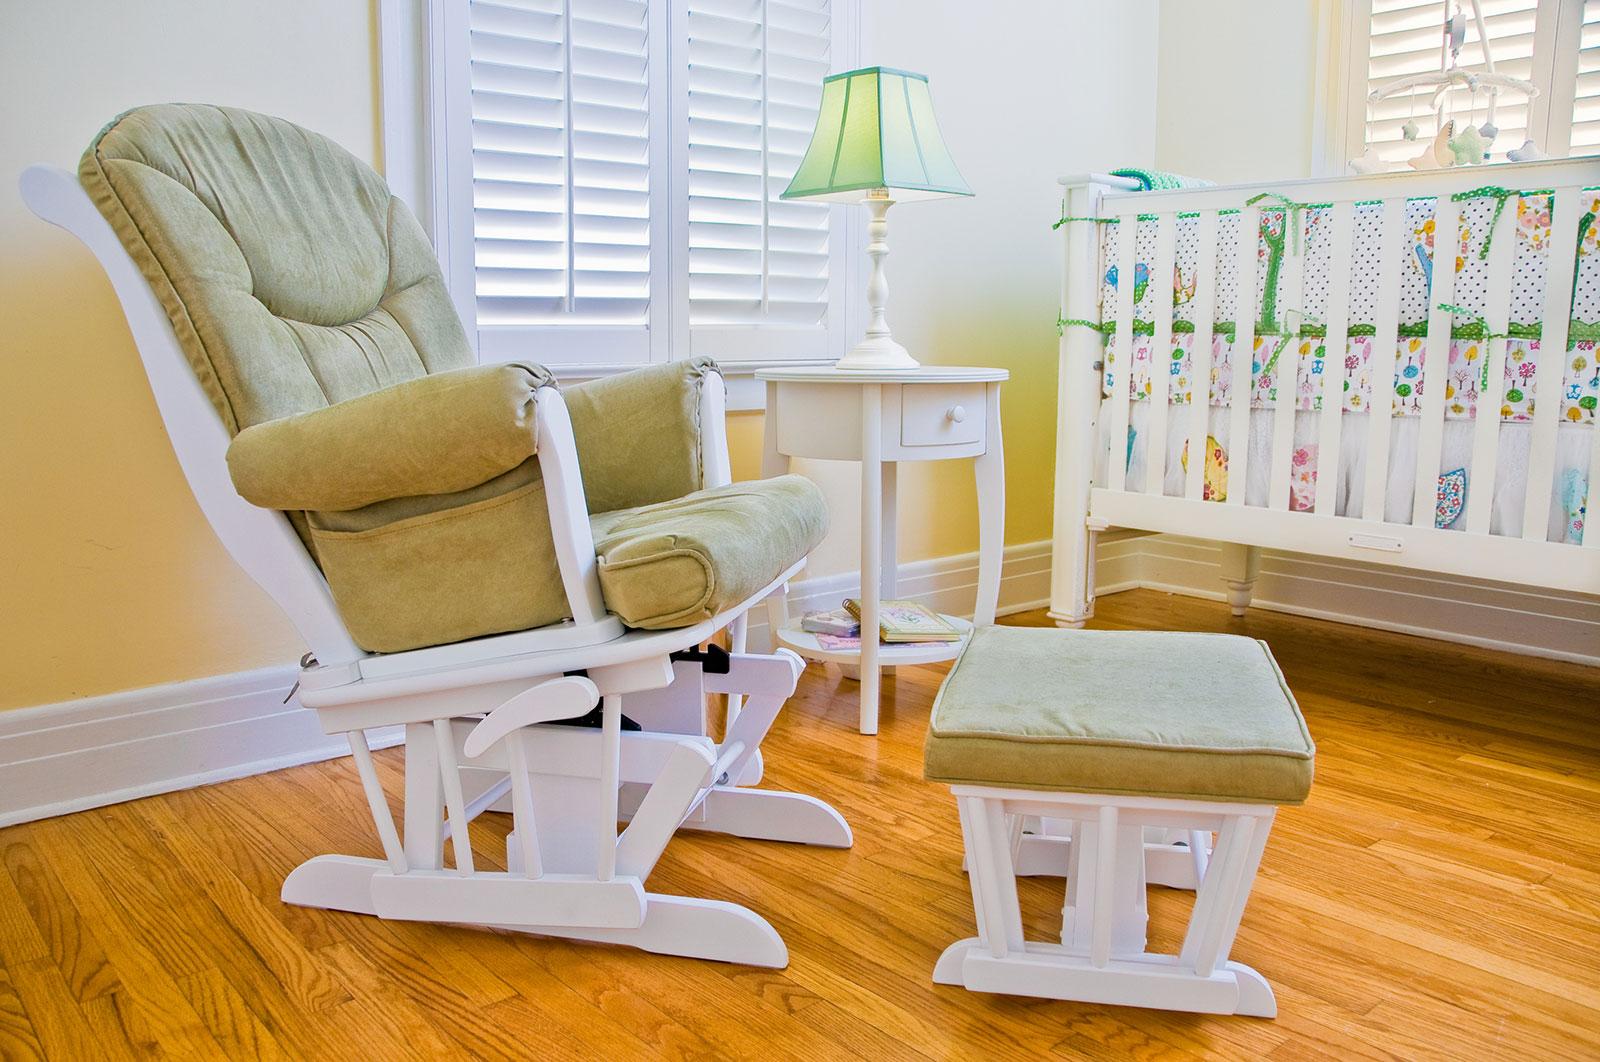 Rocking Chair Cushions For Baby Nursery